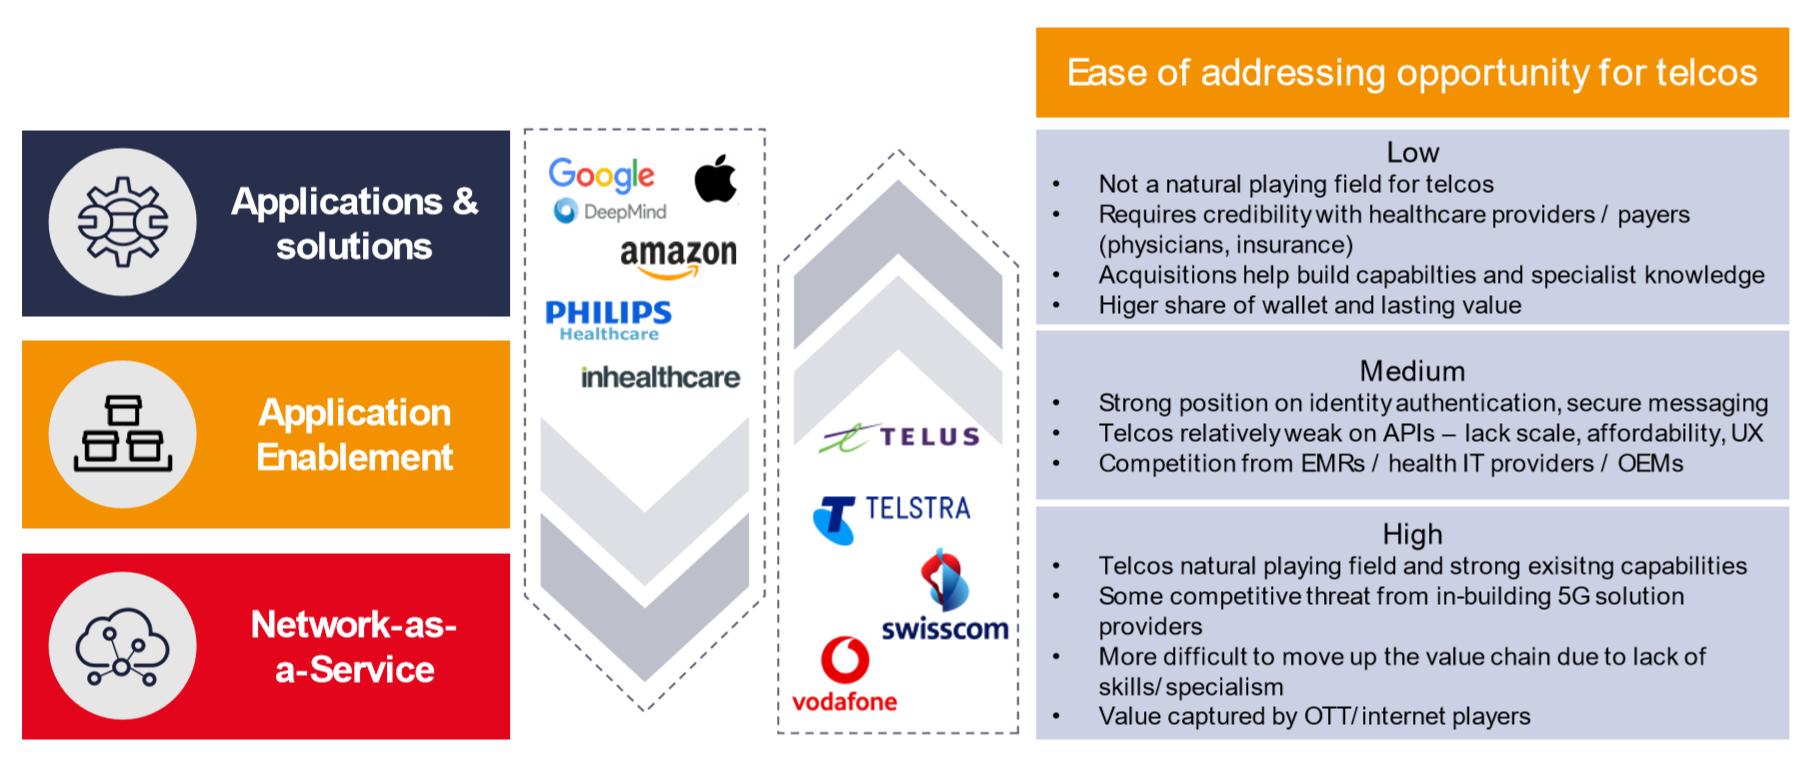 Addressing opportunity for telcos in digital health